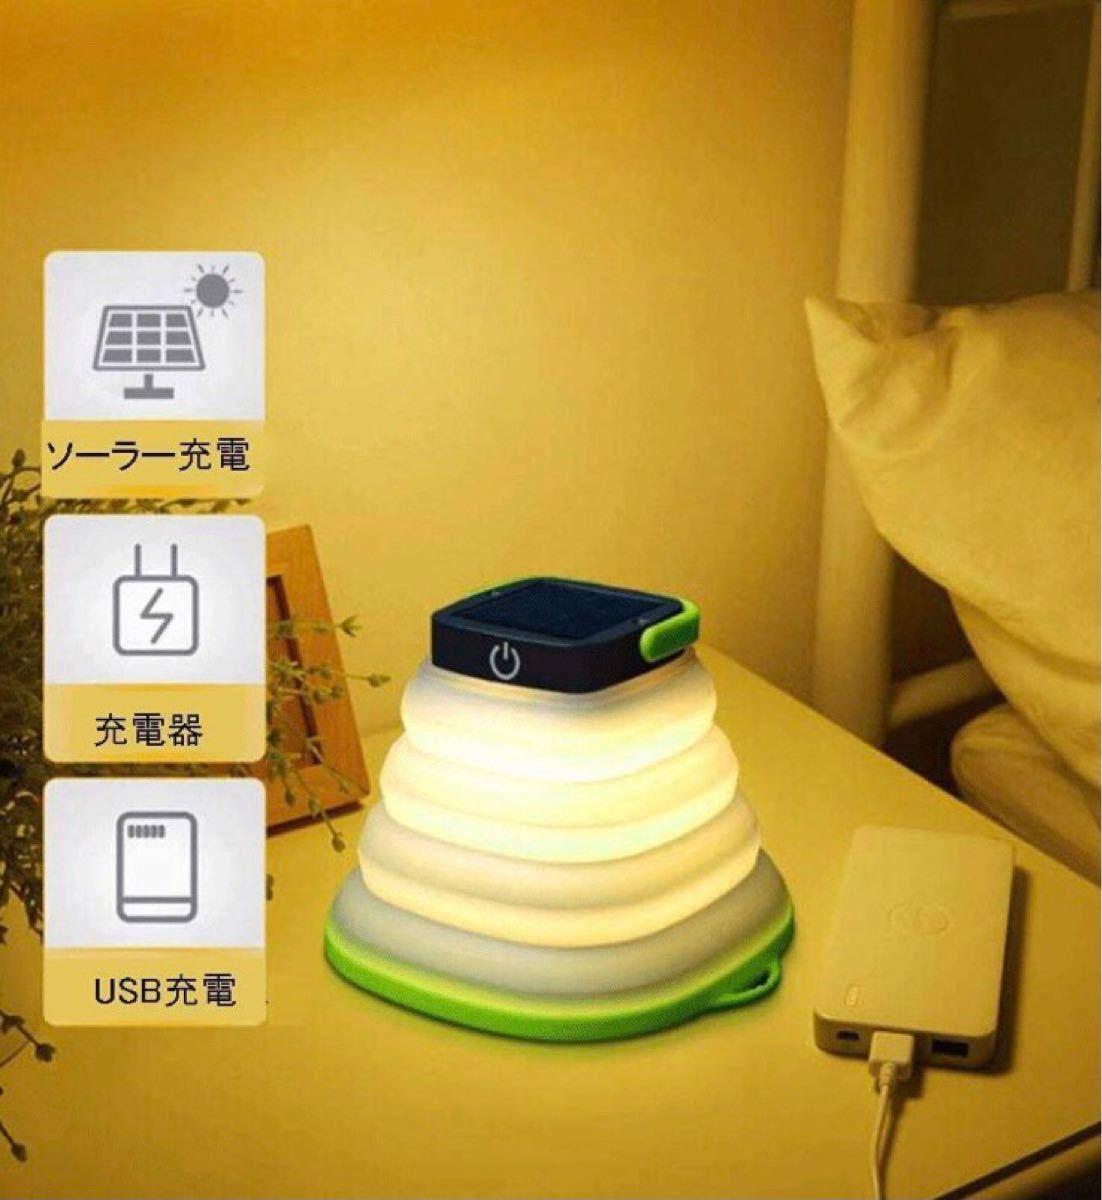 LEDランタン ソーラー充電、USB充電 折り畳み式 3段階切替 IP68防水